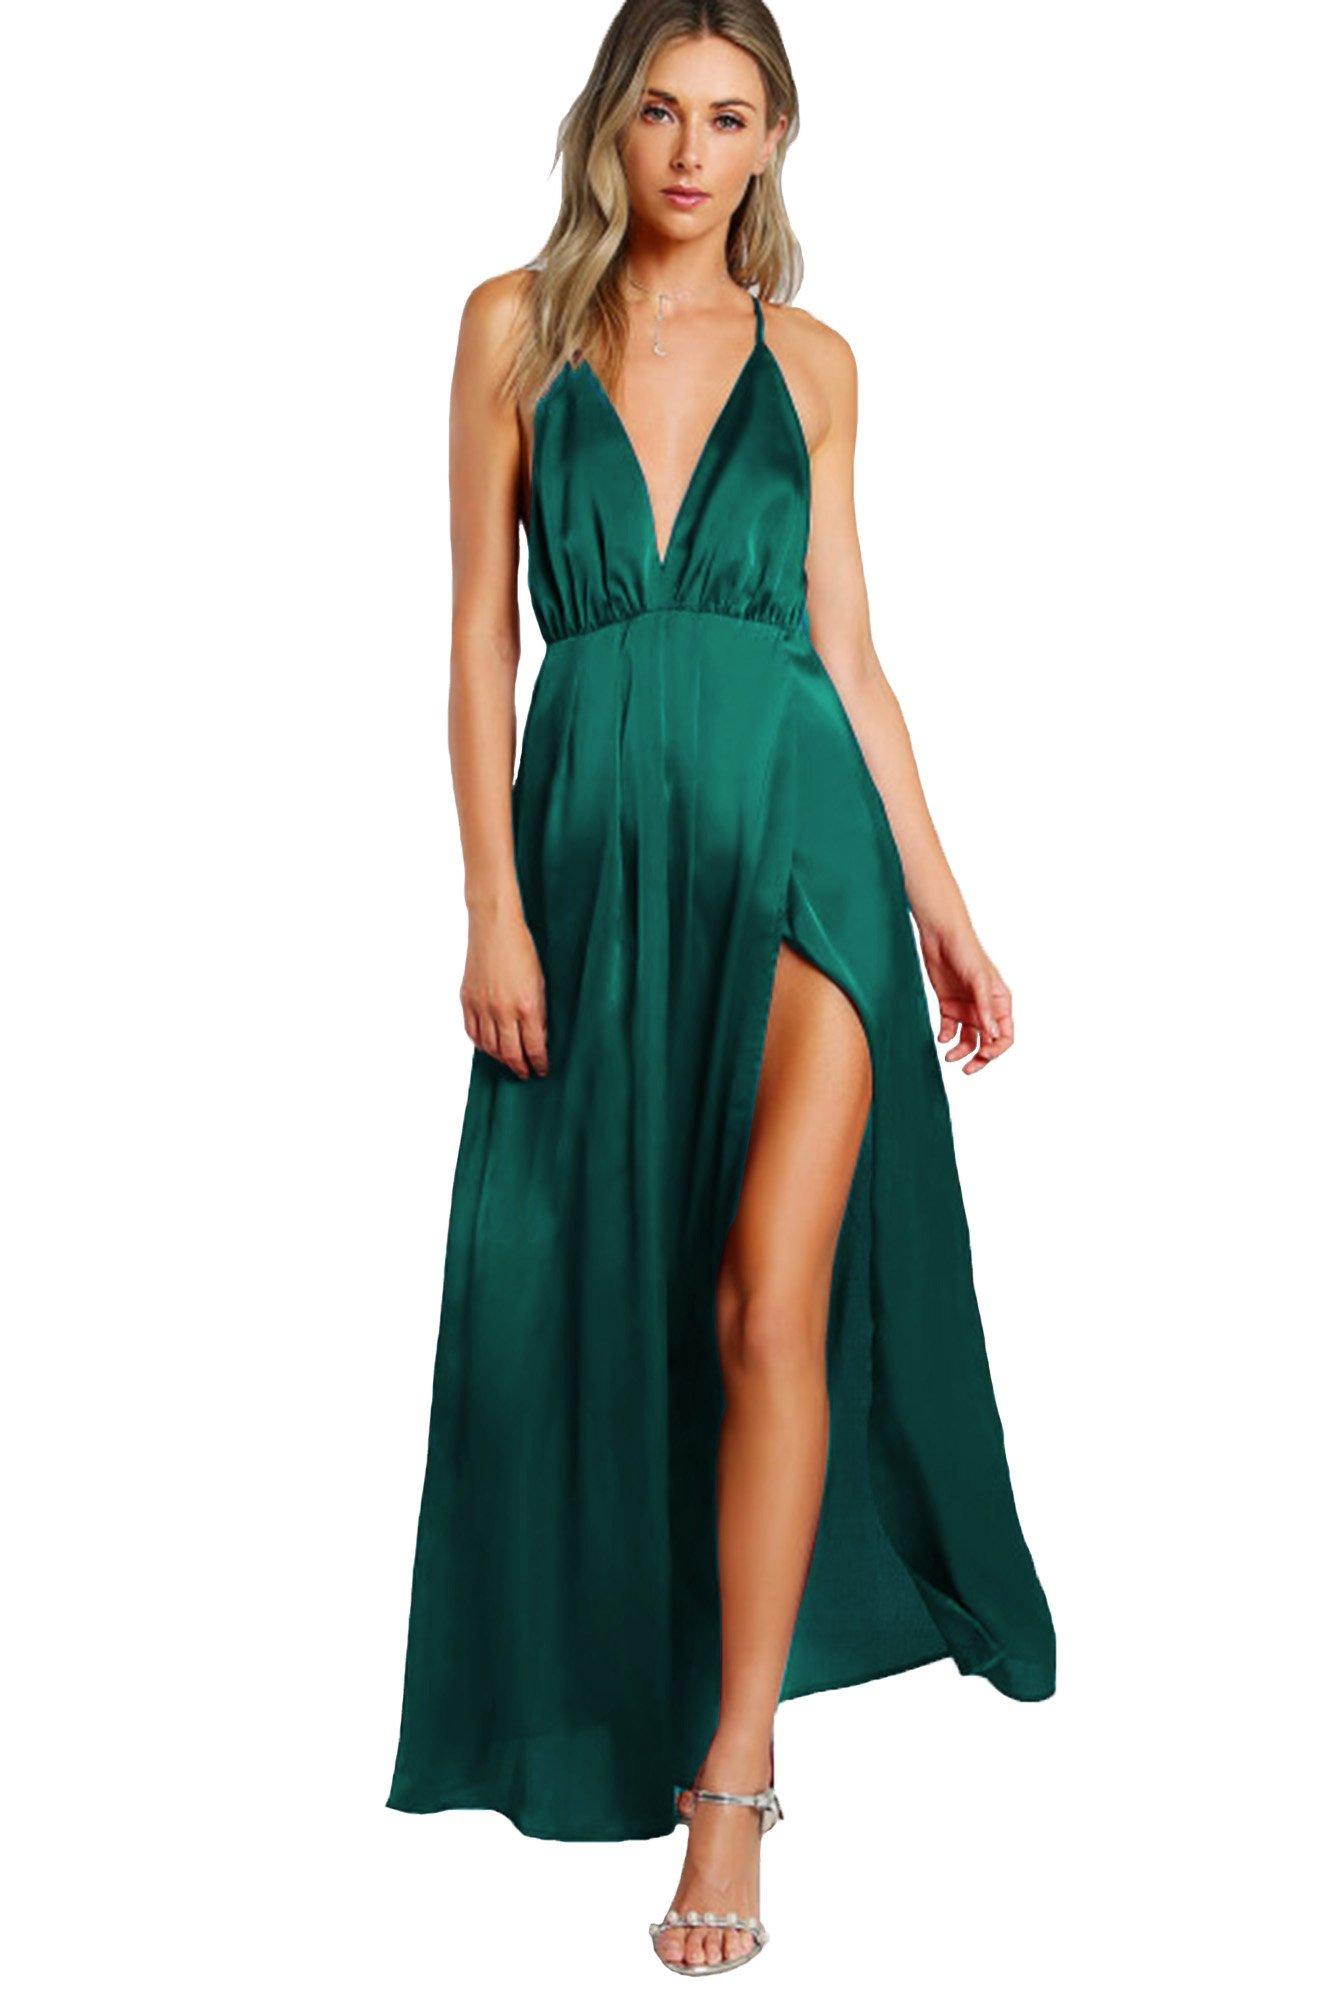 3f6f034855 SheIn Women's Sexy Satin Deep V Neck Backless Maxi Party Evening Dress Dark  Green Large